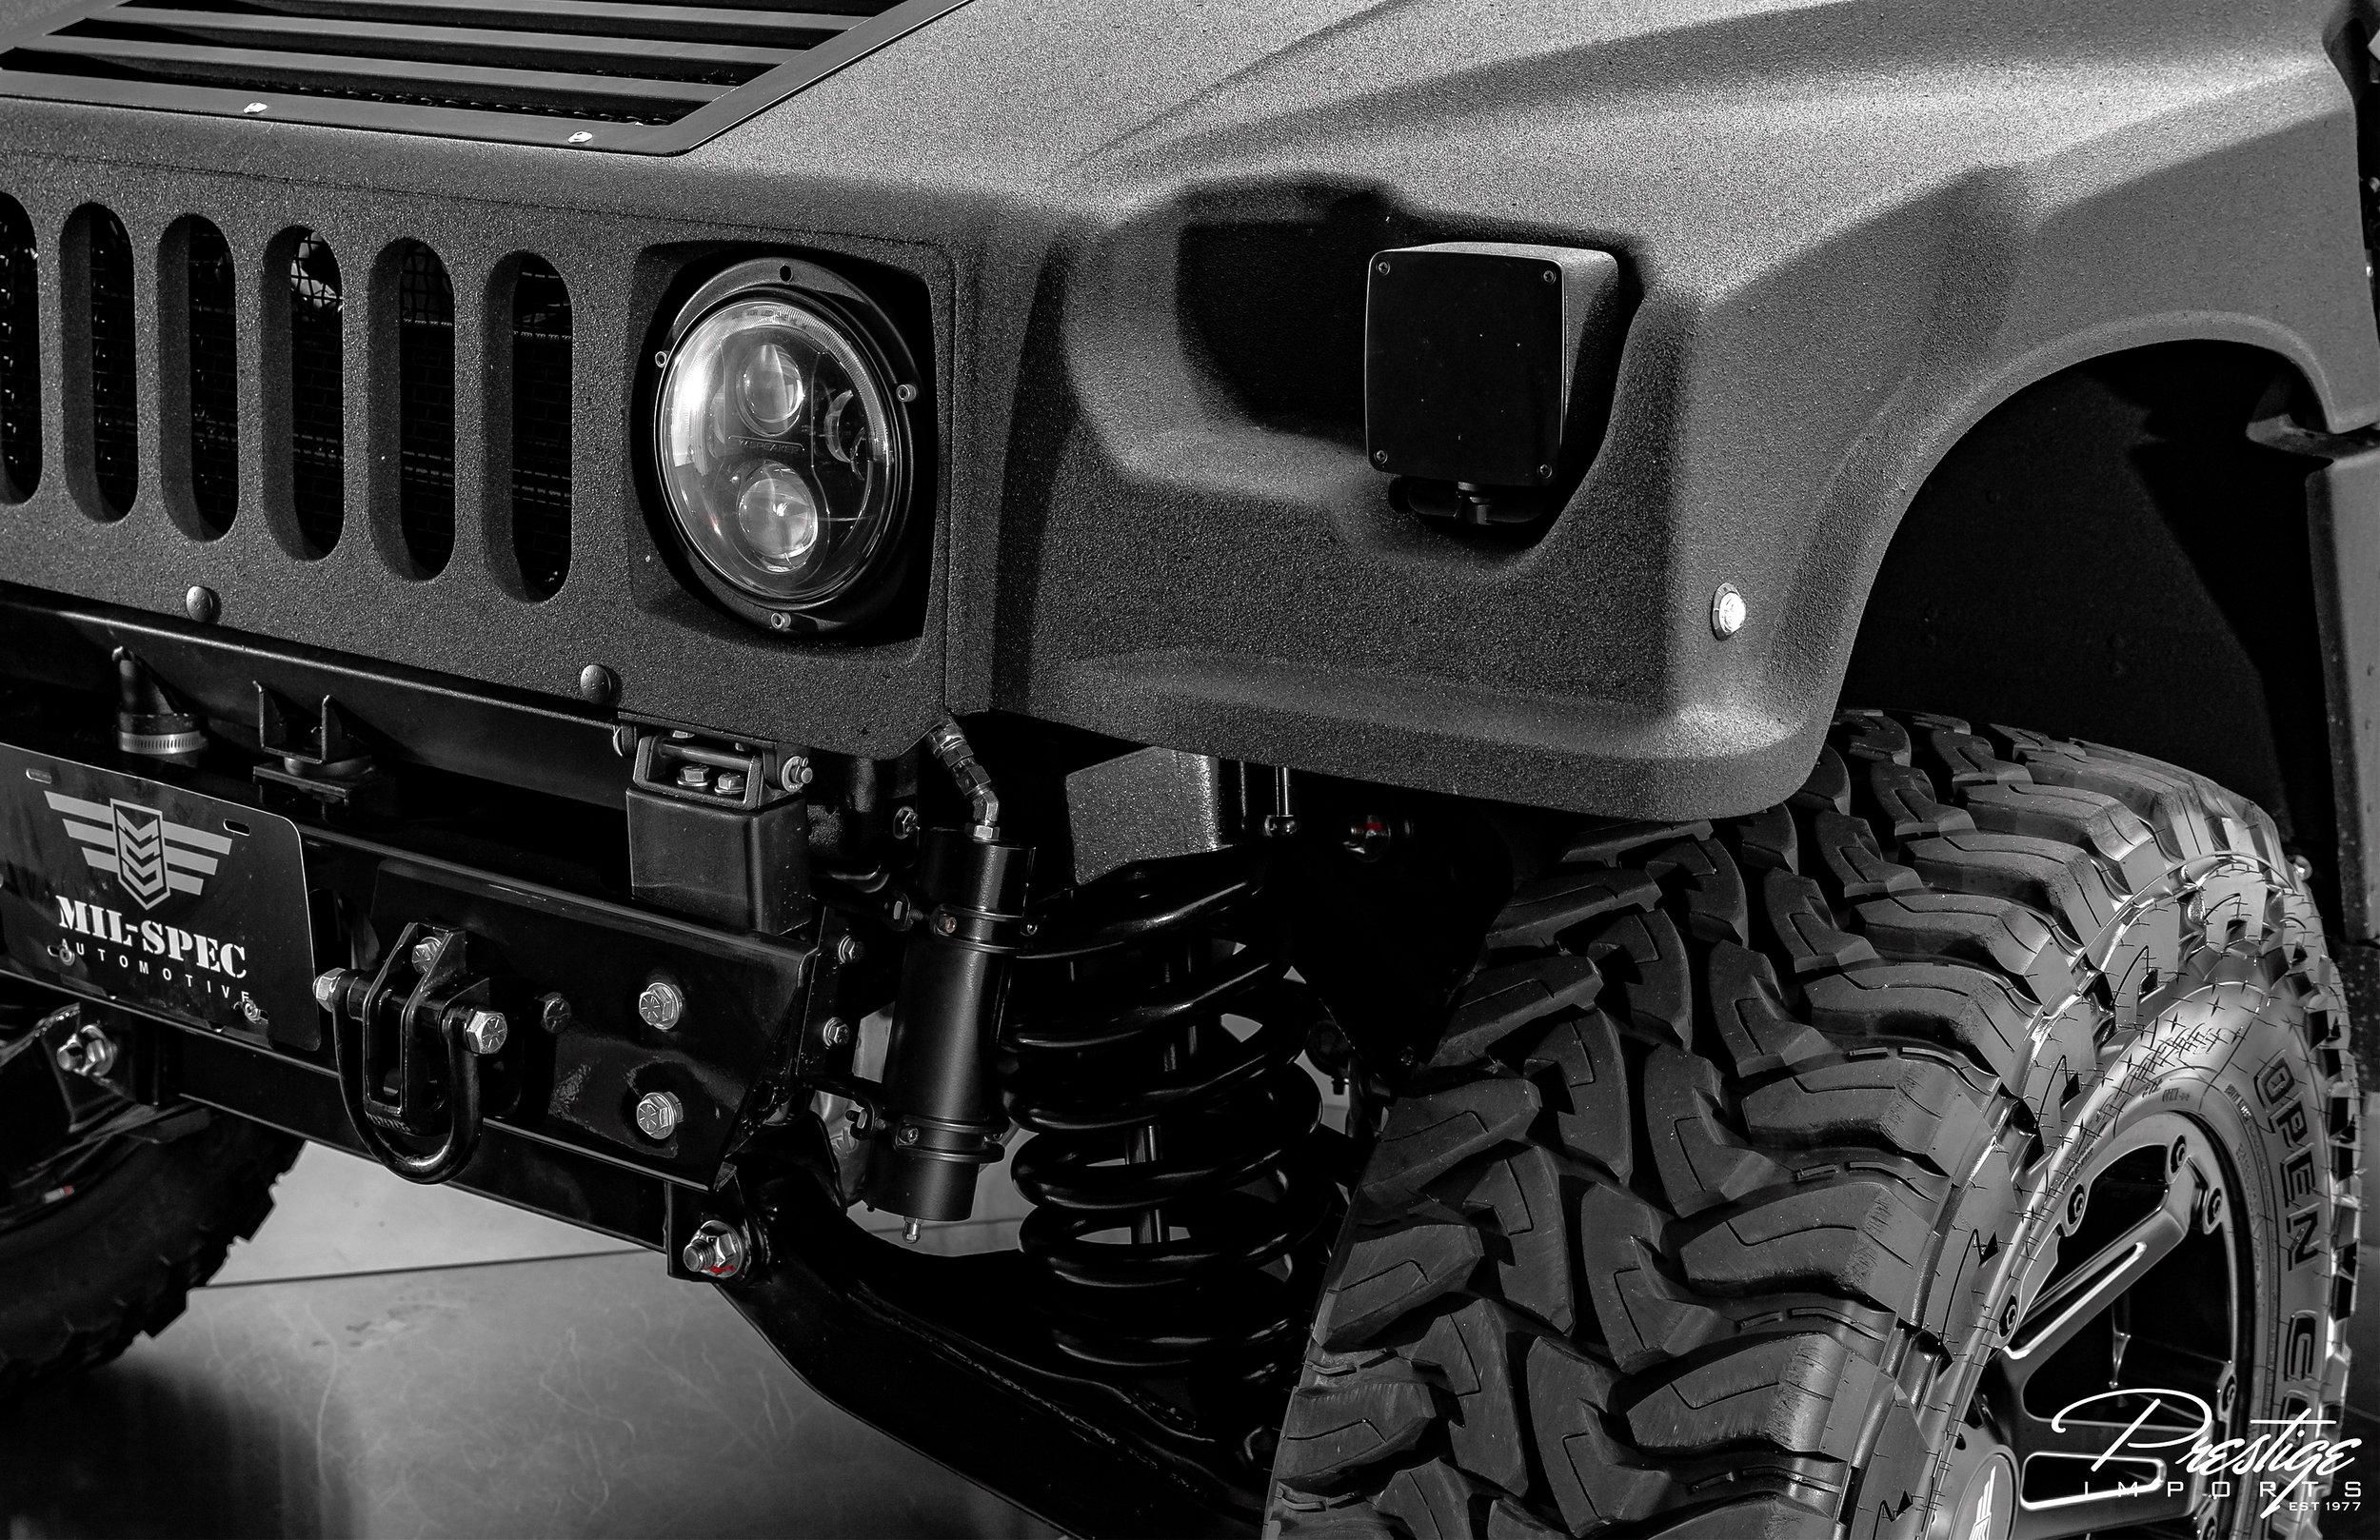 Mil_Spec_Automotive_Hummer_H1_007_Exterior_4.jpg